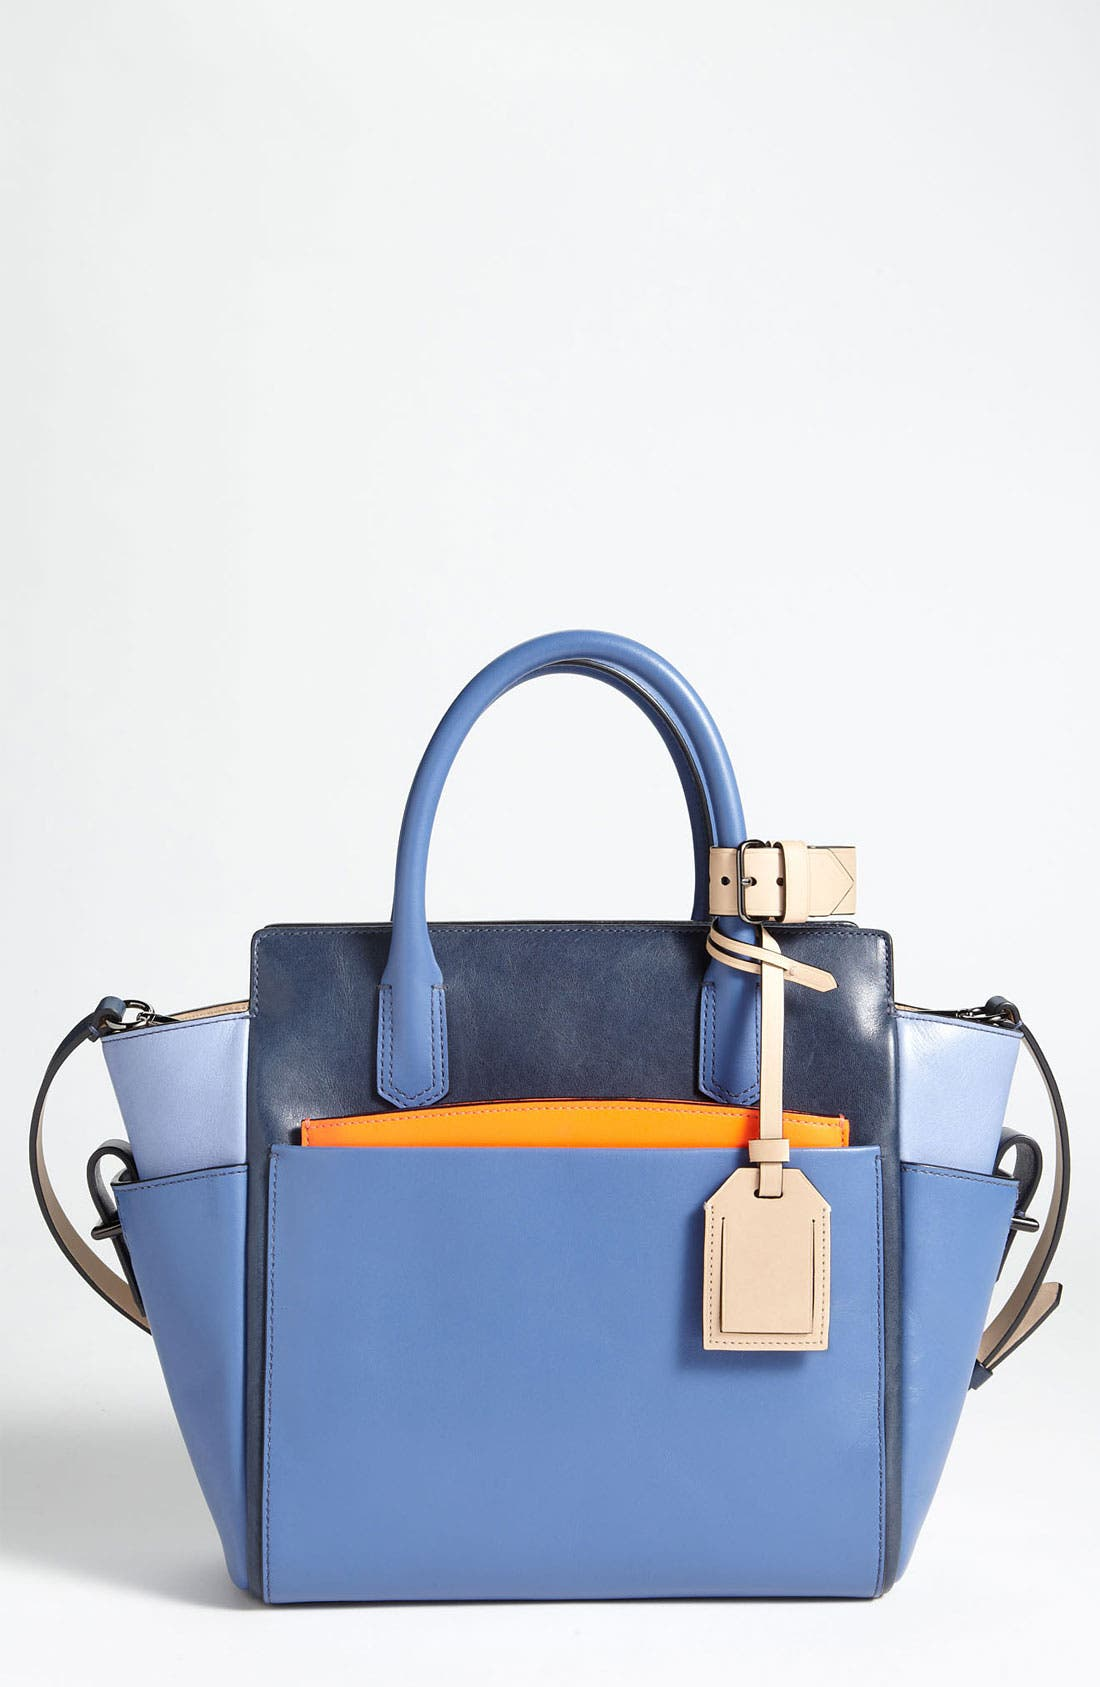 Alternate Image 1 Selected - Reed Krakoff 'Atlantique - Mini' Colorblock Leather Satchel